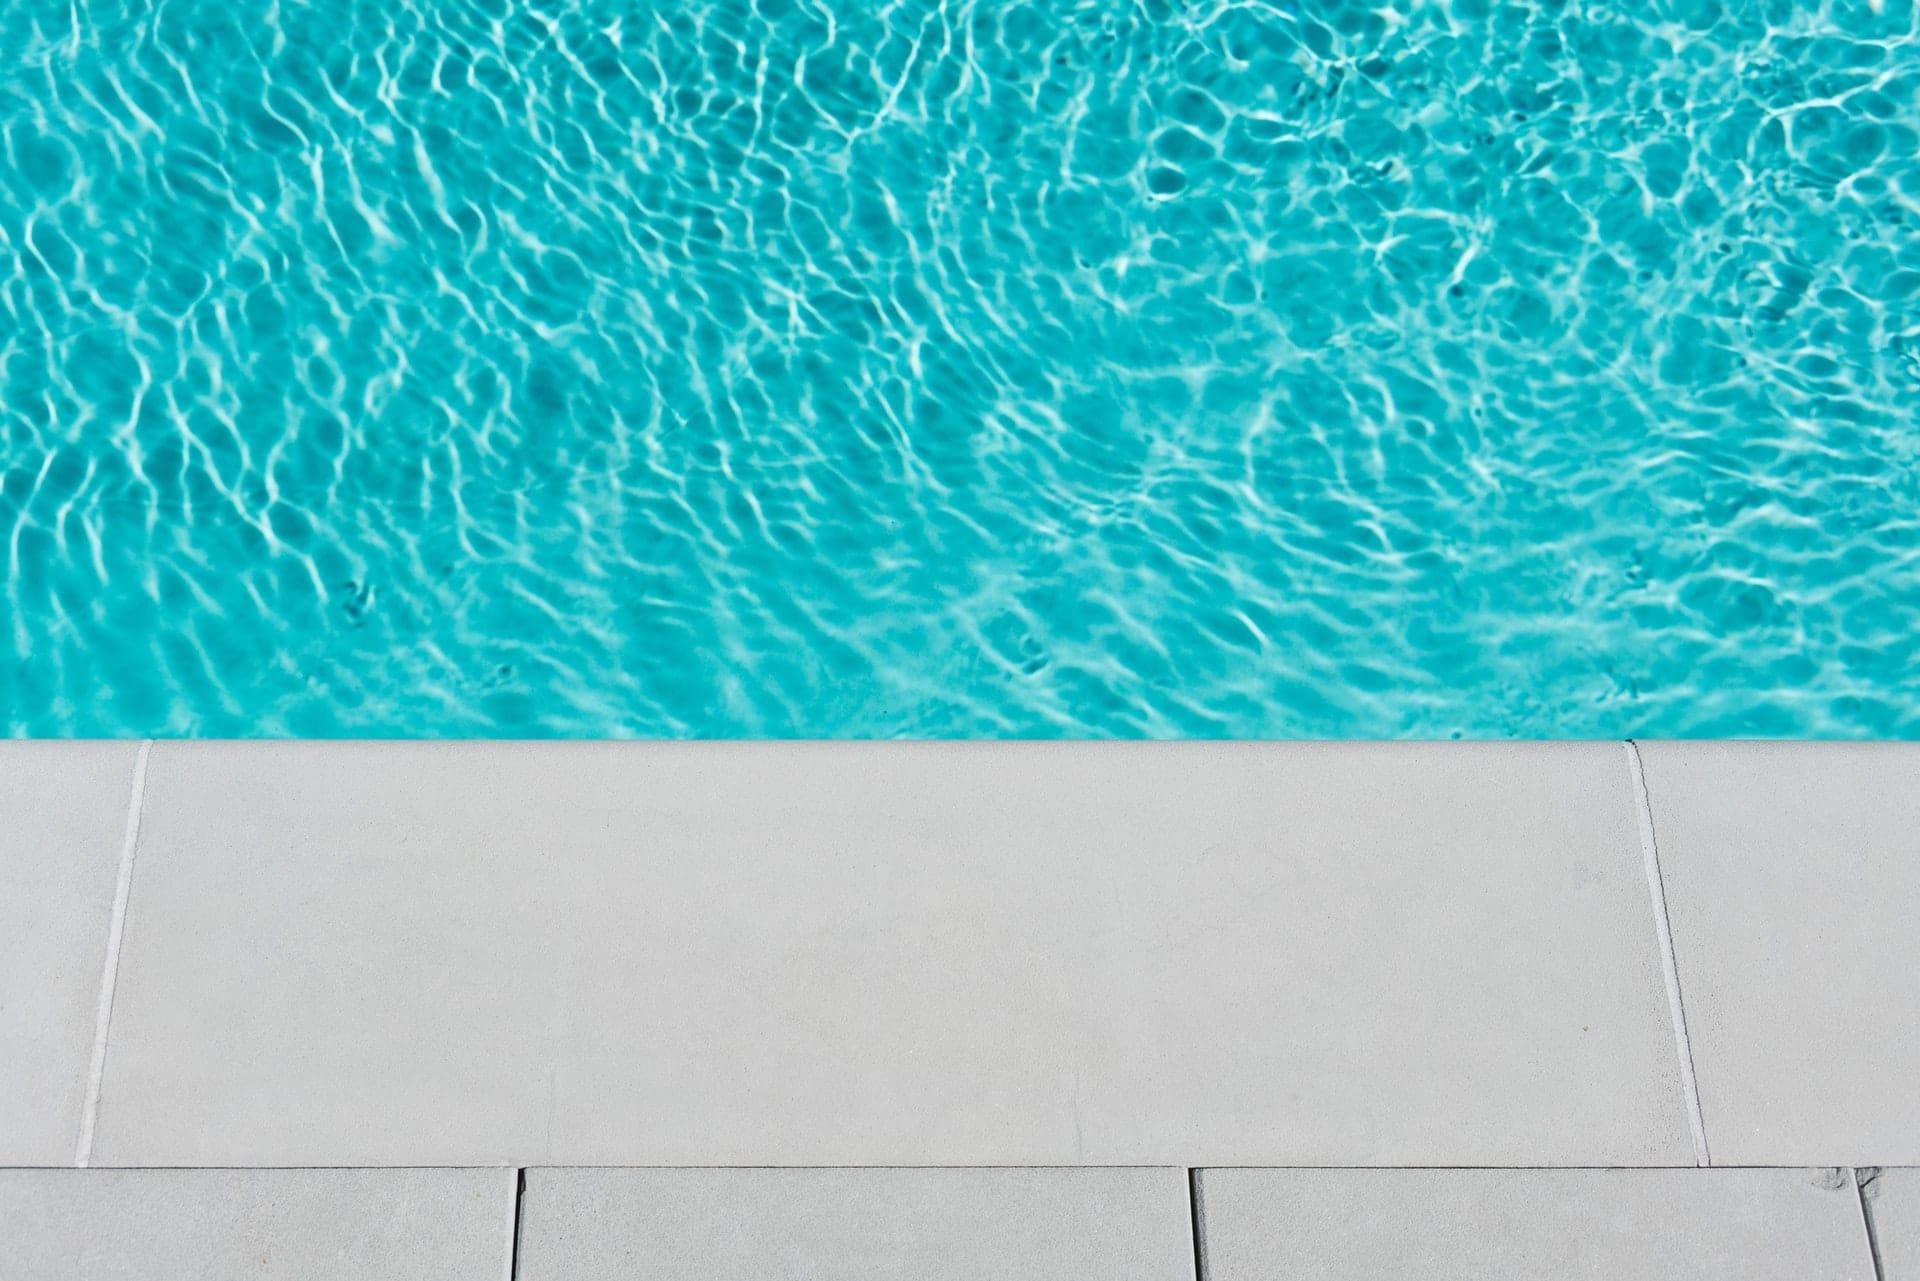 pool spa inspection charlotte nc